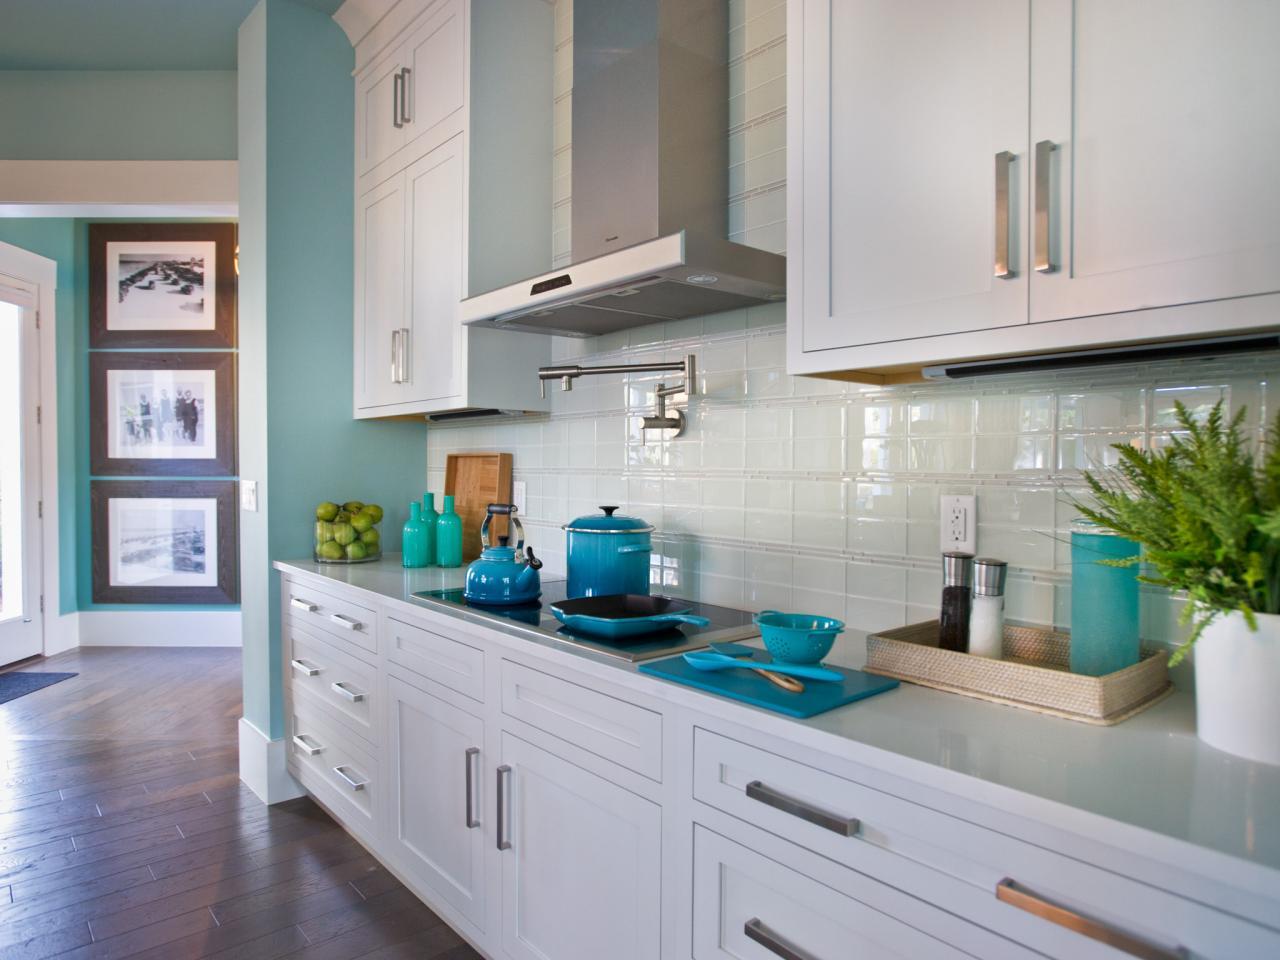 White Kitchen Backsplash Ideas - HomesFeed